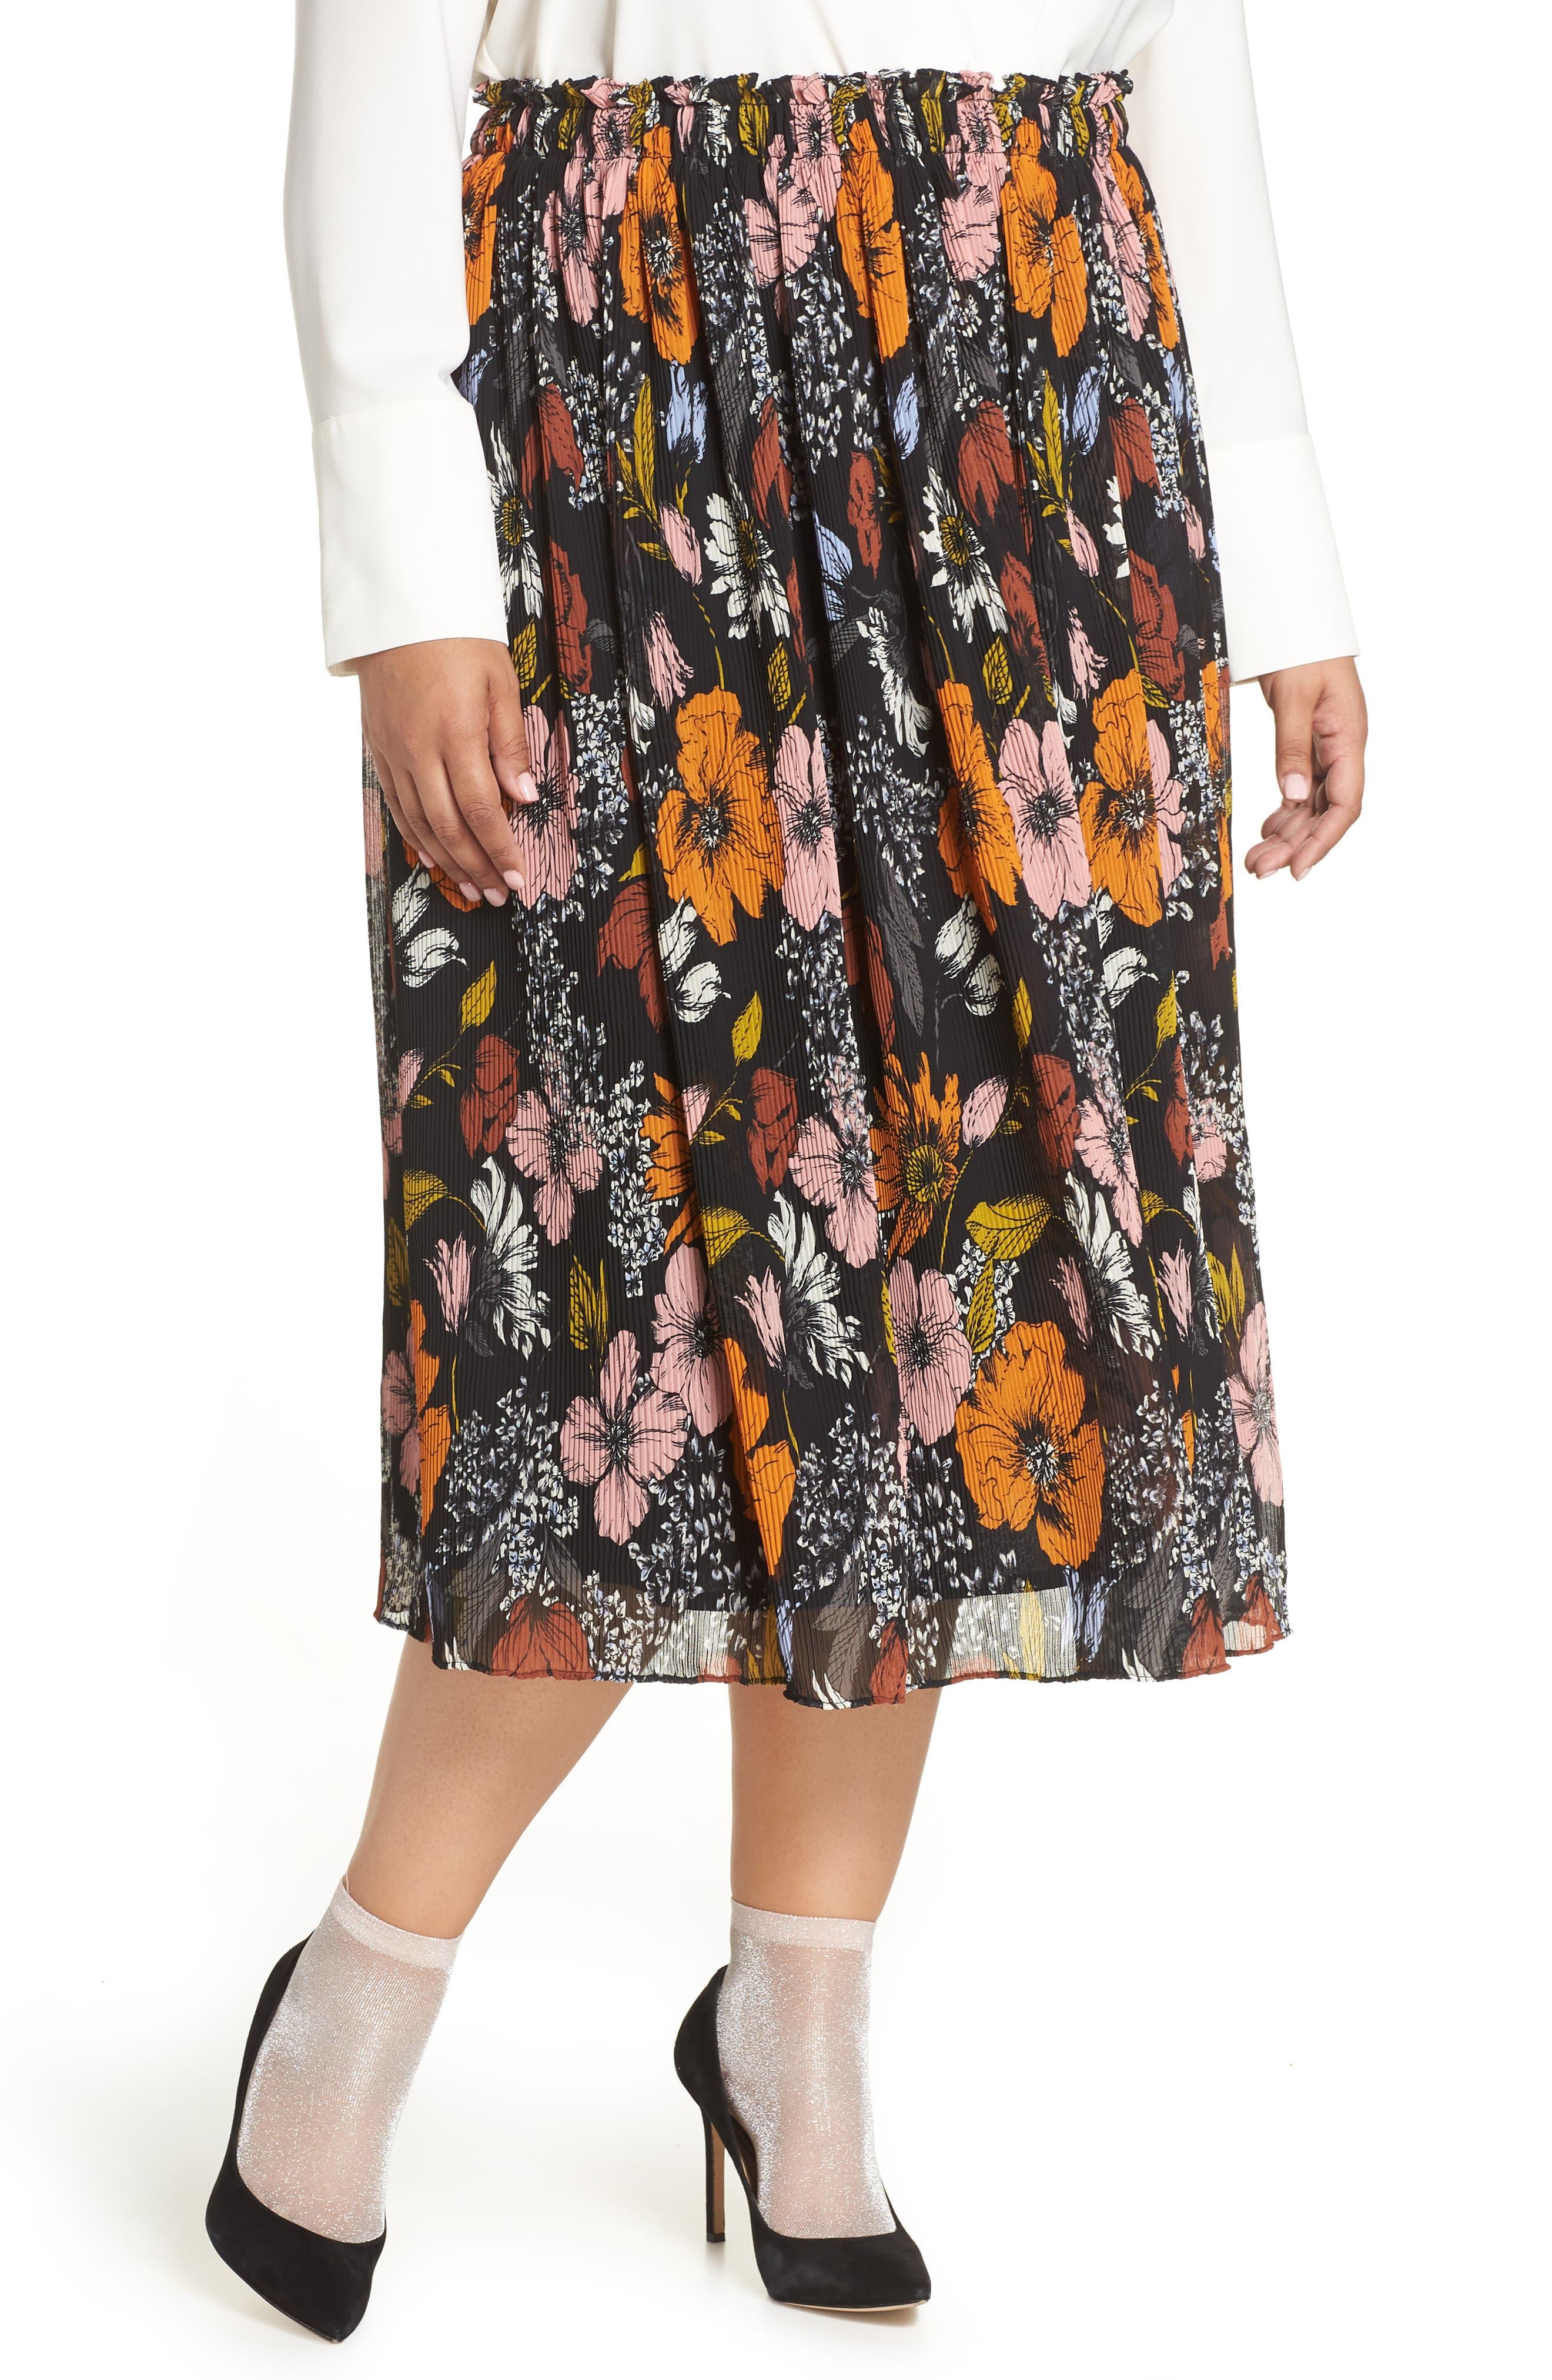 Plus Size Halogen X Atlantic-Pacific Crinkle Midi Skirt, Black